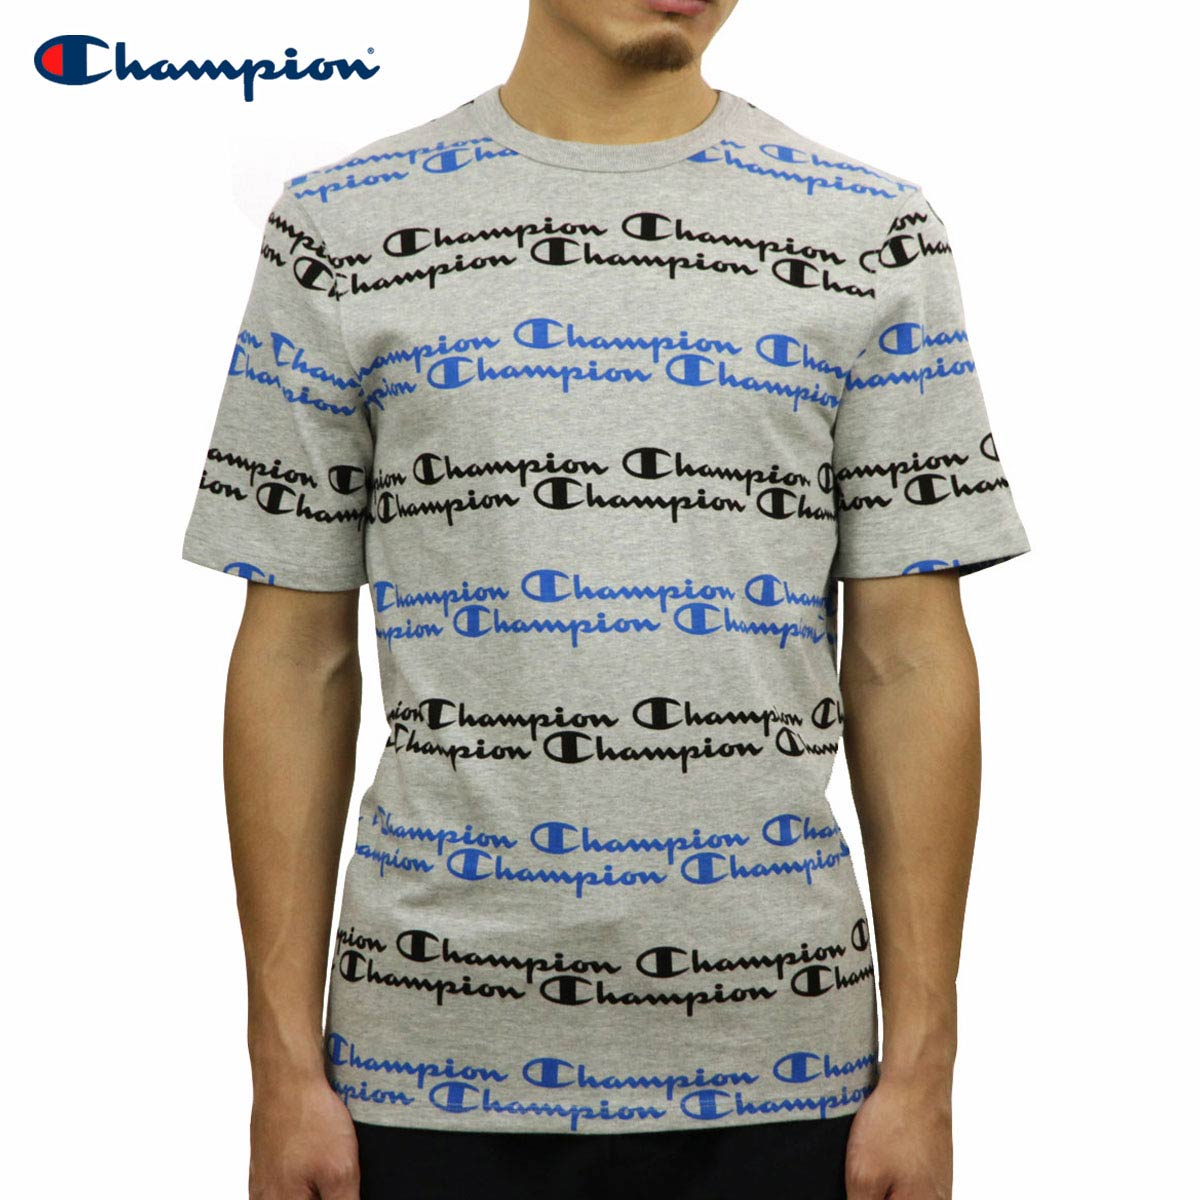 7643d9cd5 Categories. « All Categories · Men's Clothing · Tops · T-shirts & Tank Tops  · Champion CHAMPION regular article men short sleeves T-shirt CREW TEE ...